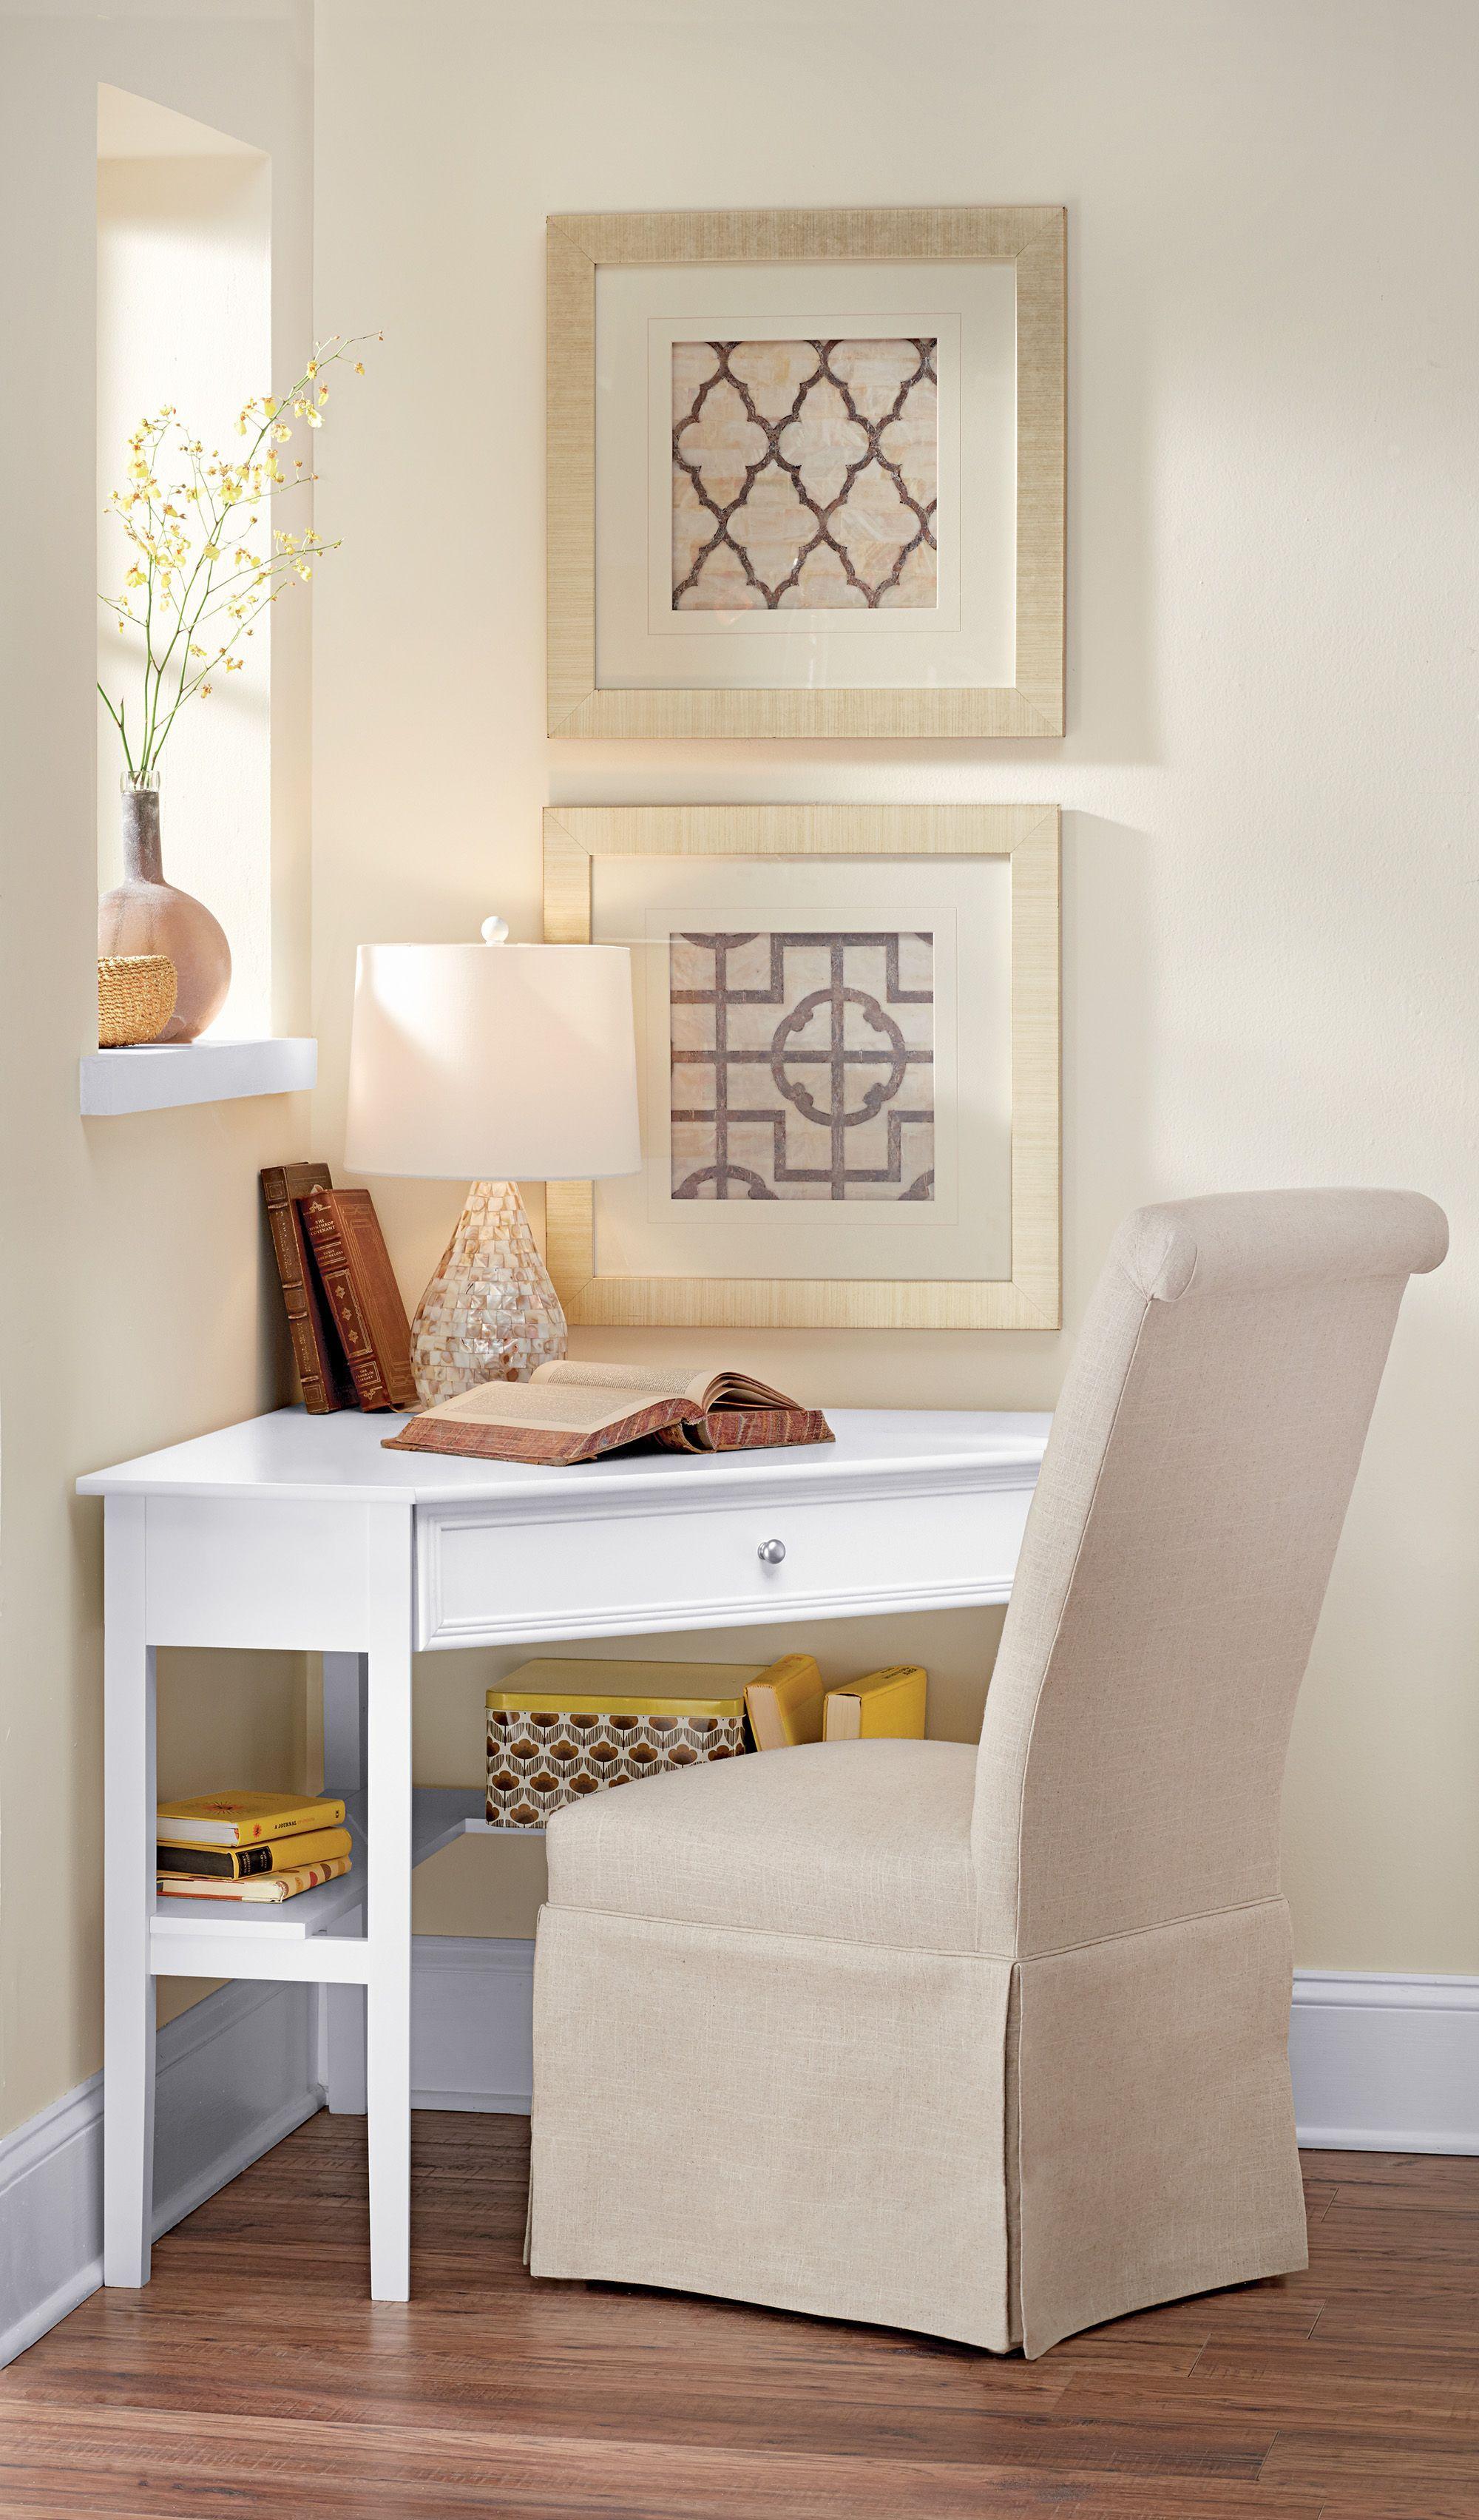 Homedecorators storeeverthing also best desk decor design ideas  fun accessoris diys for your rh pinterest